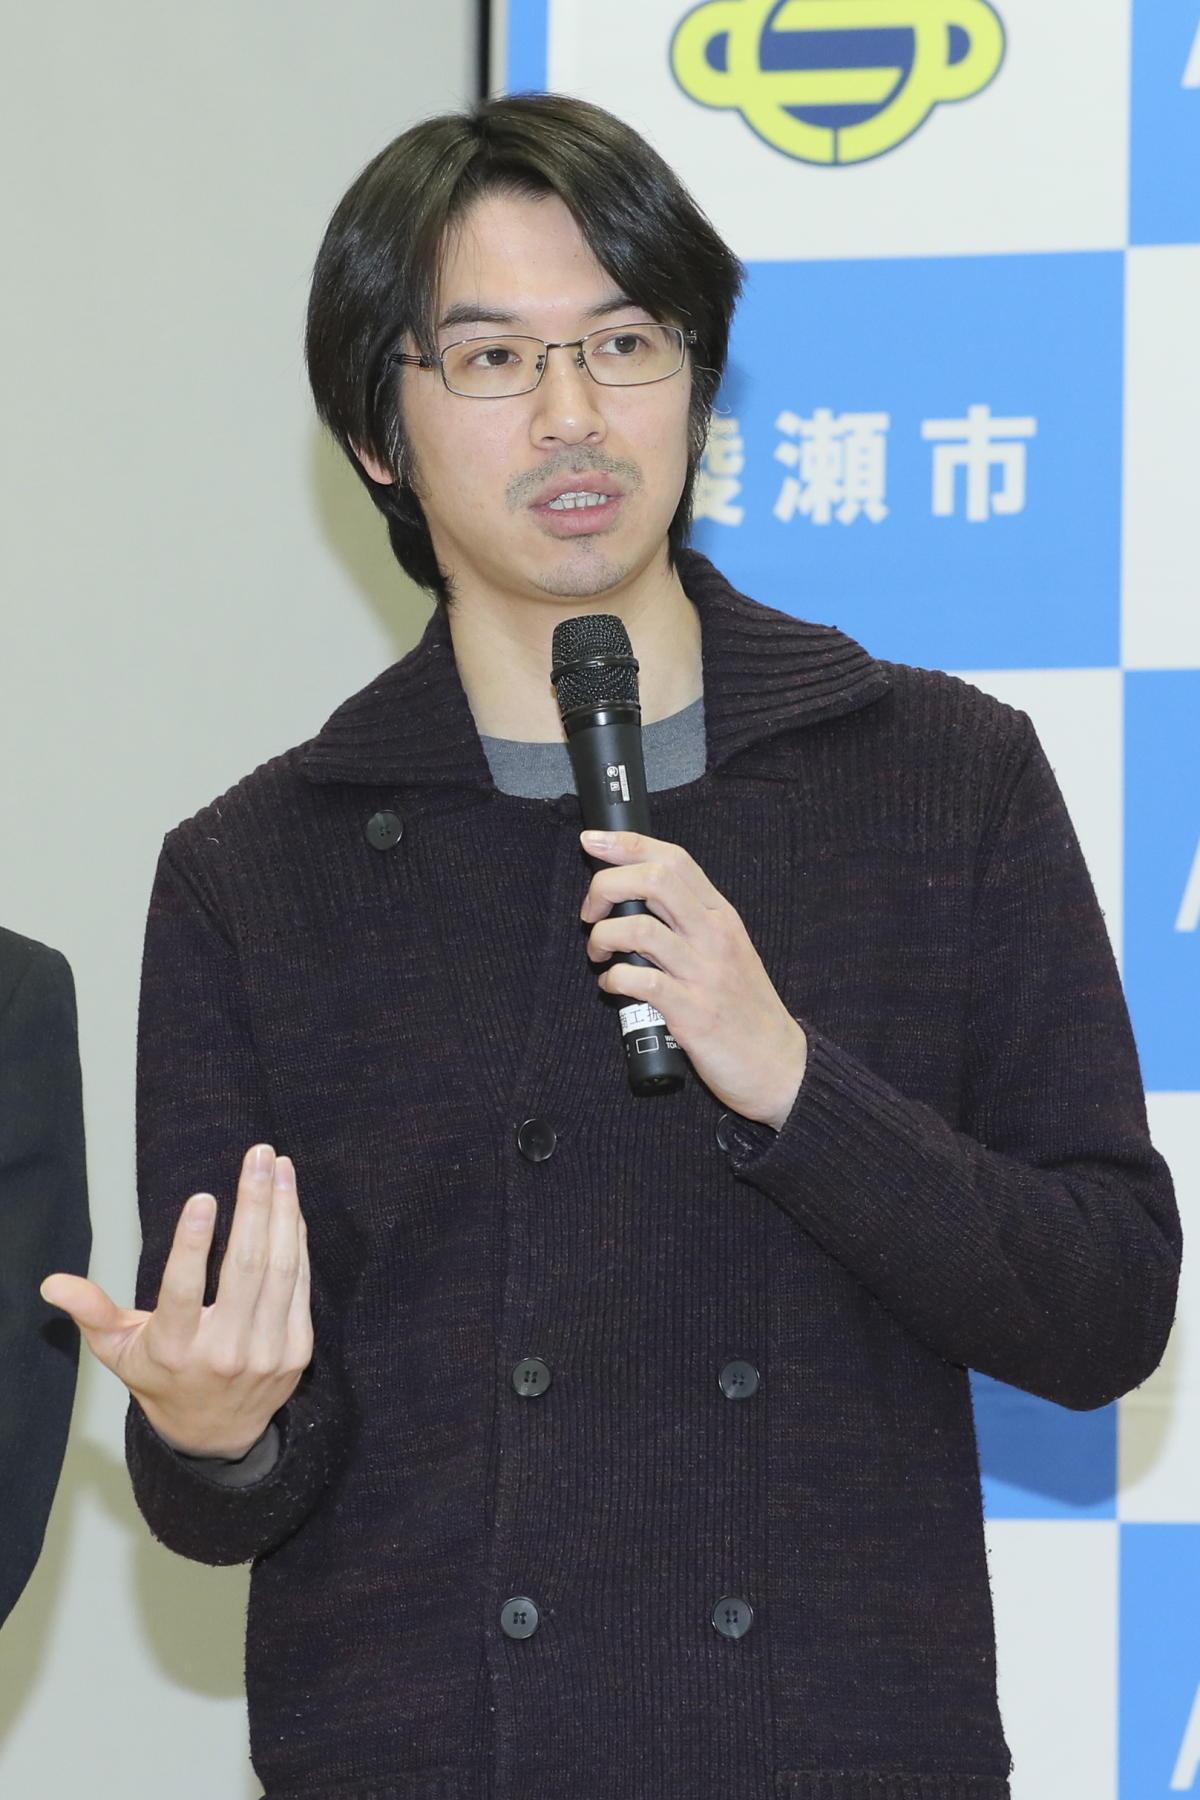 http://news.yoshimoto.co.jp/20190115223859-87c9afcb588e5433bf65cb75c99397a55cf22dfe.jpg